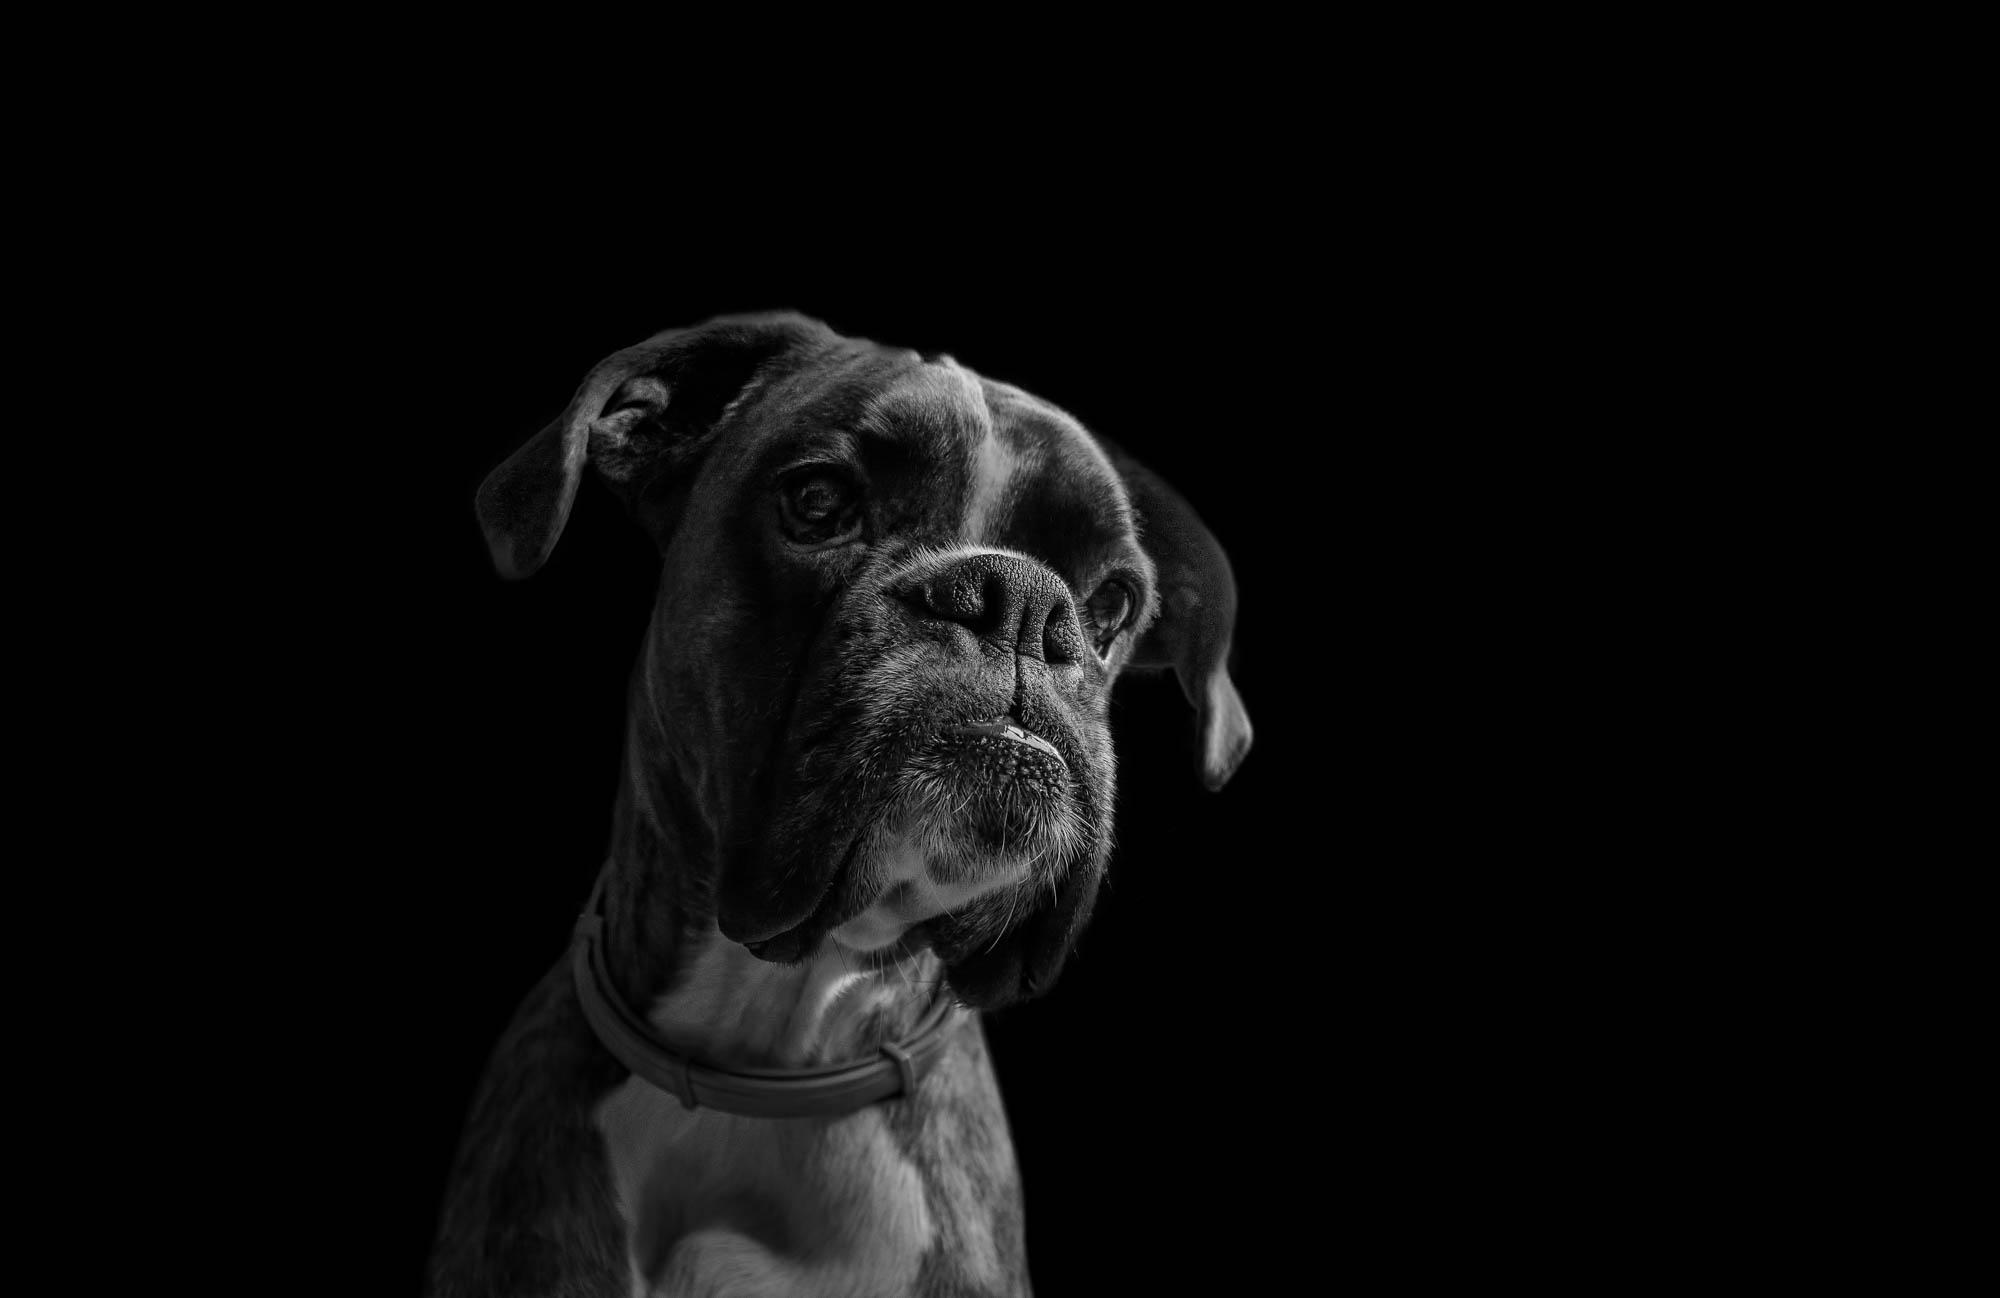 Boxer dog portrait in black and white